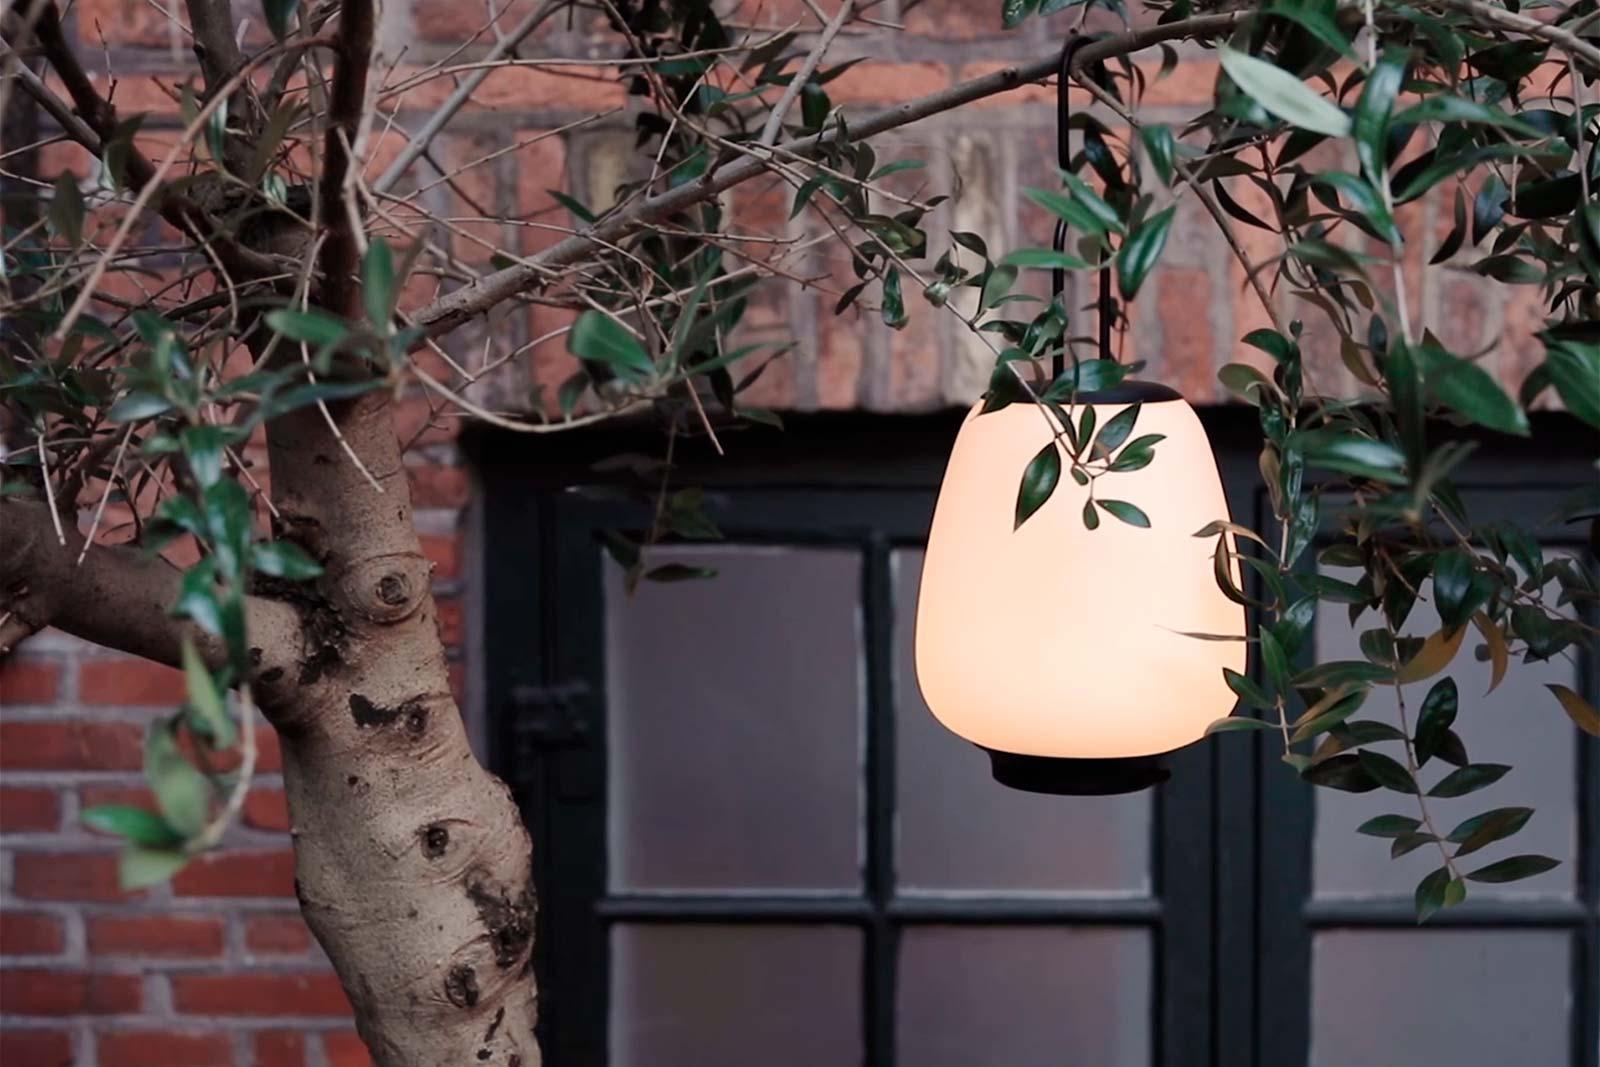 Lucca &Tradition Lampe Outdoor Boutique Danoise Basel Daenische Designer Moebel Accessoires Wohnen News